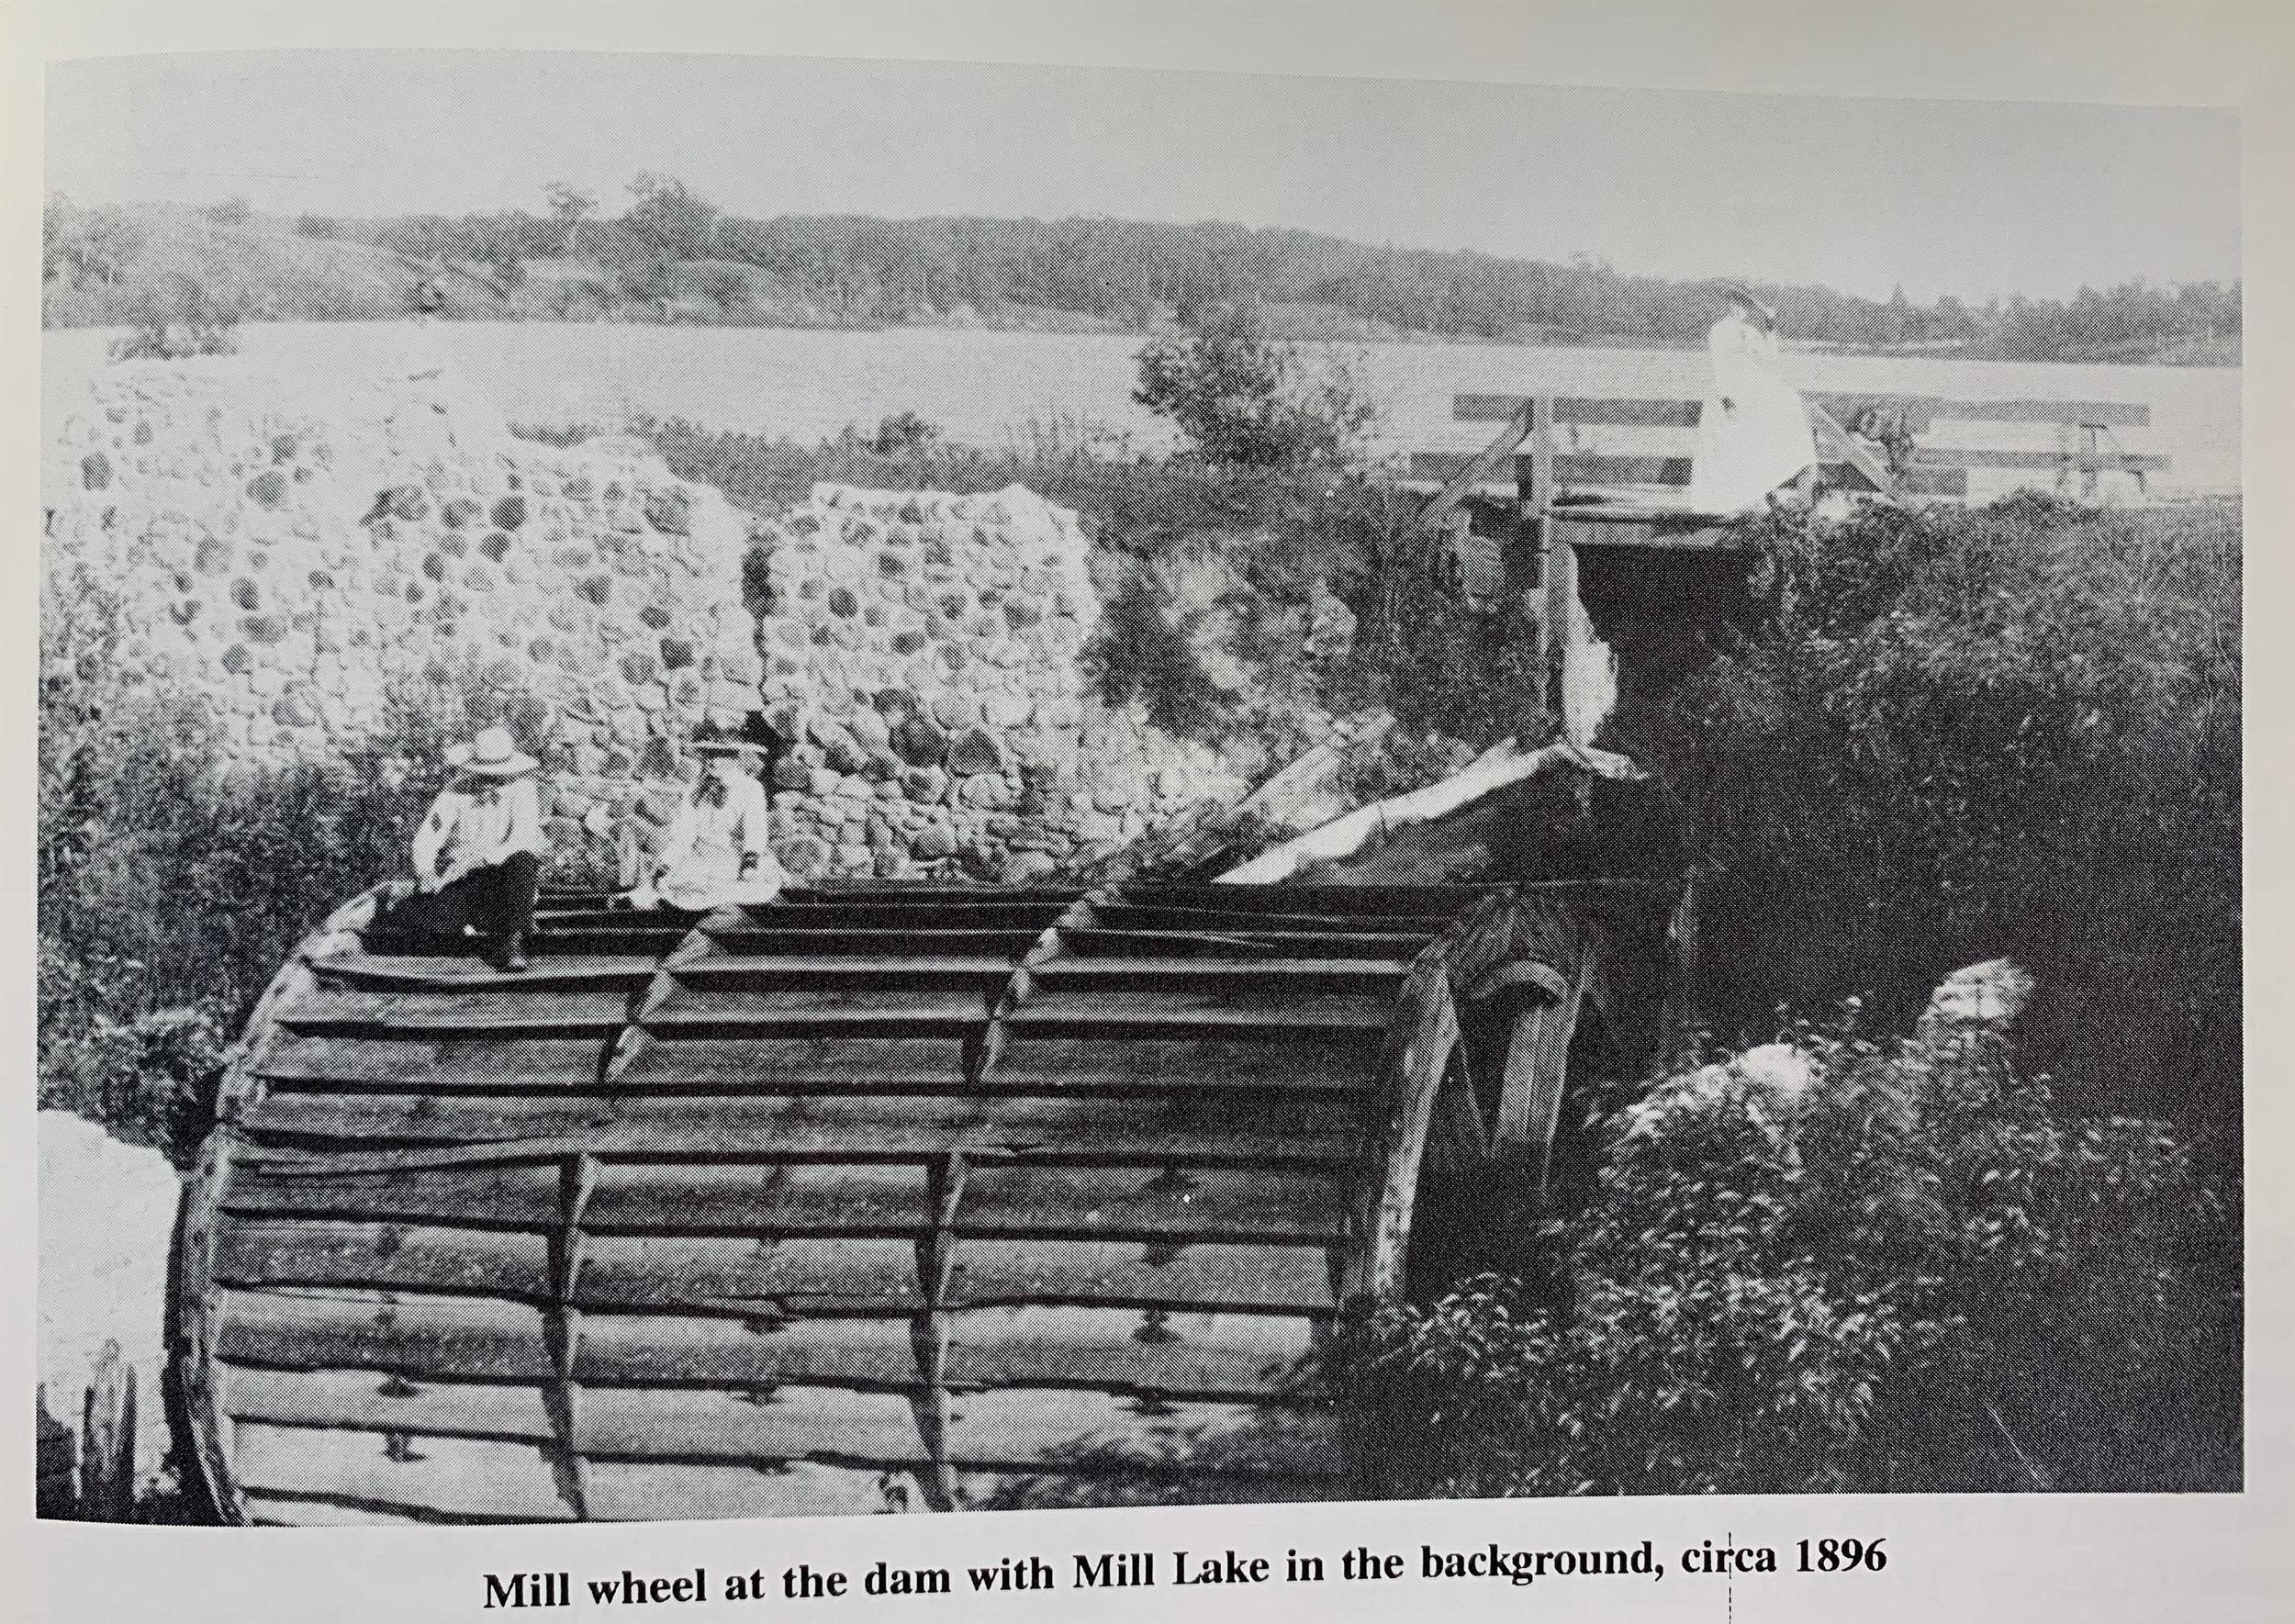 Lake_Beulah_History_LBYC-002.jpg